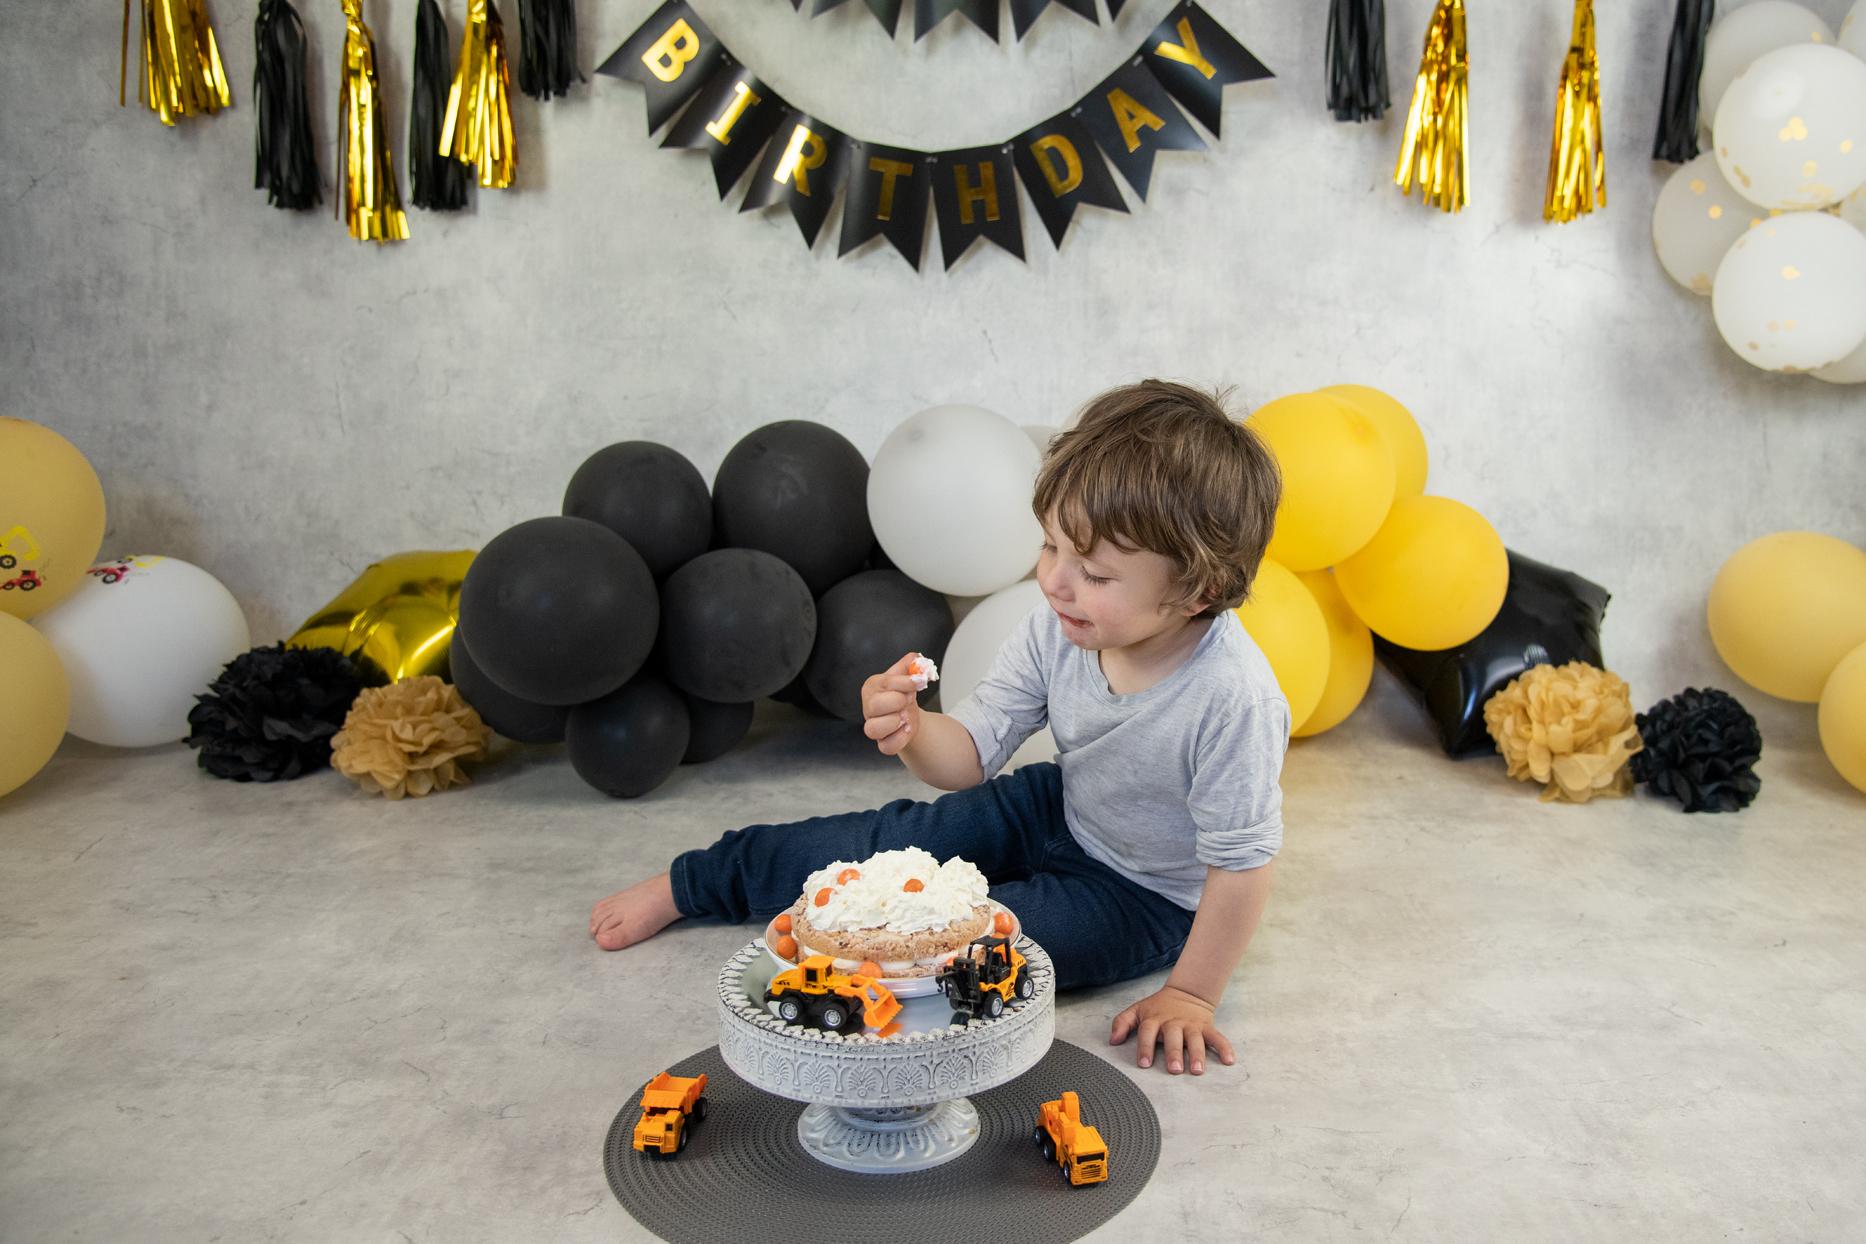 Smashed-the-cake_Vincent_2021_web-10